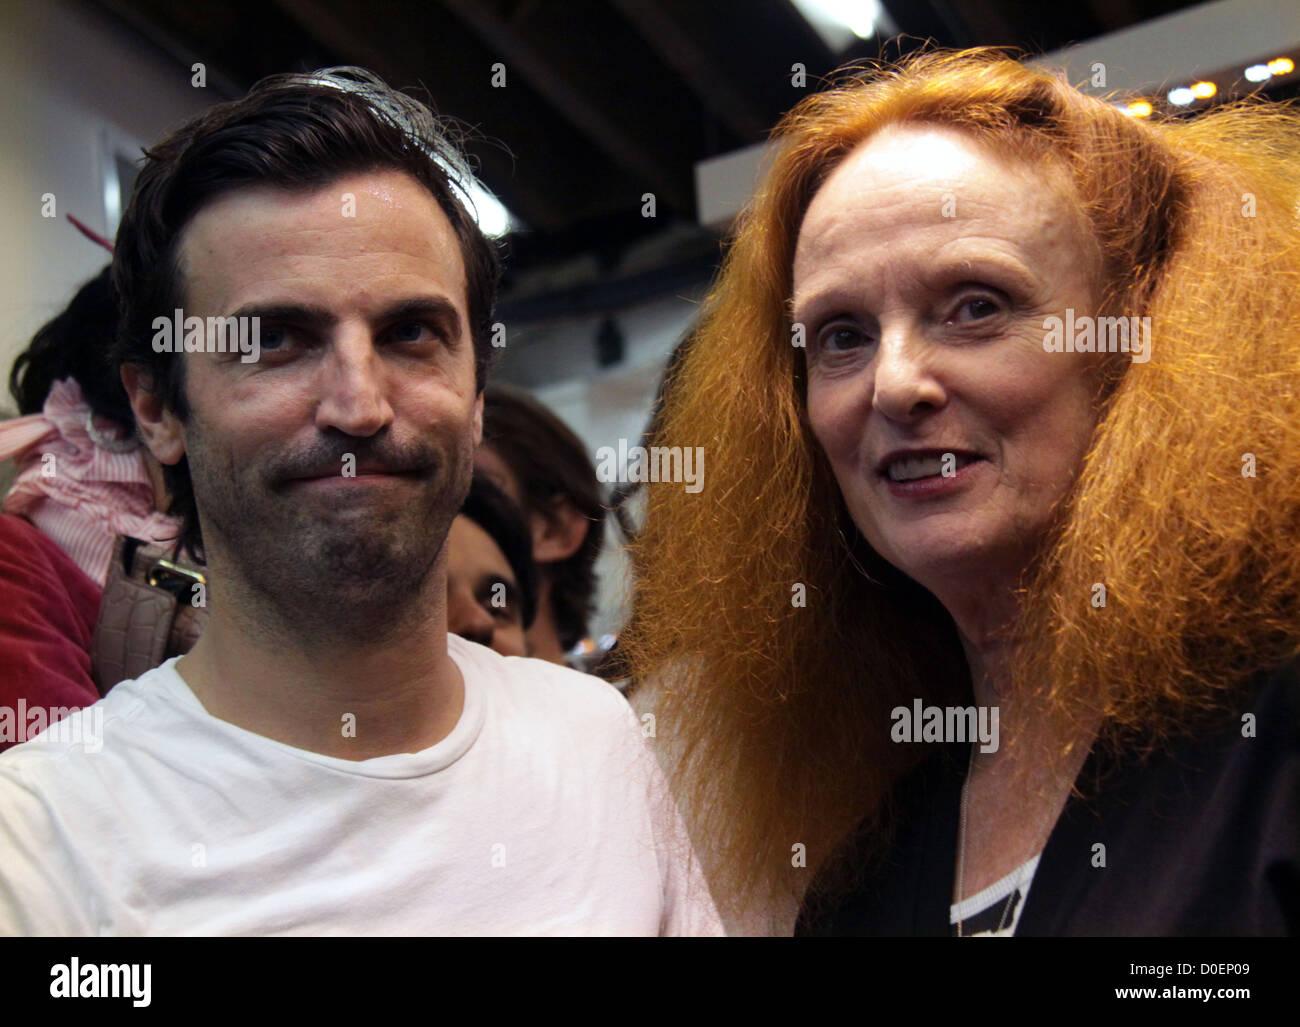 Nicholas Ghesquirre and Grace Coddington Fashion's Night Out at Balenciaga boutique New York City, USA - 10.09.10 - Stock Image